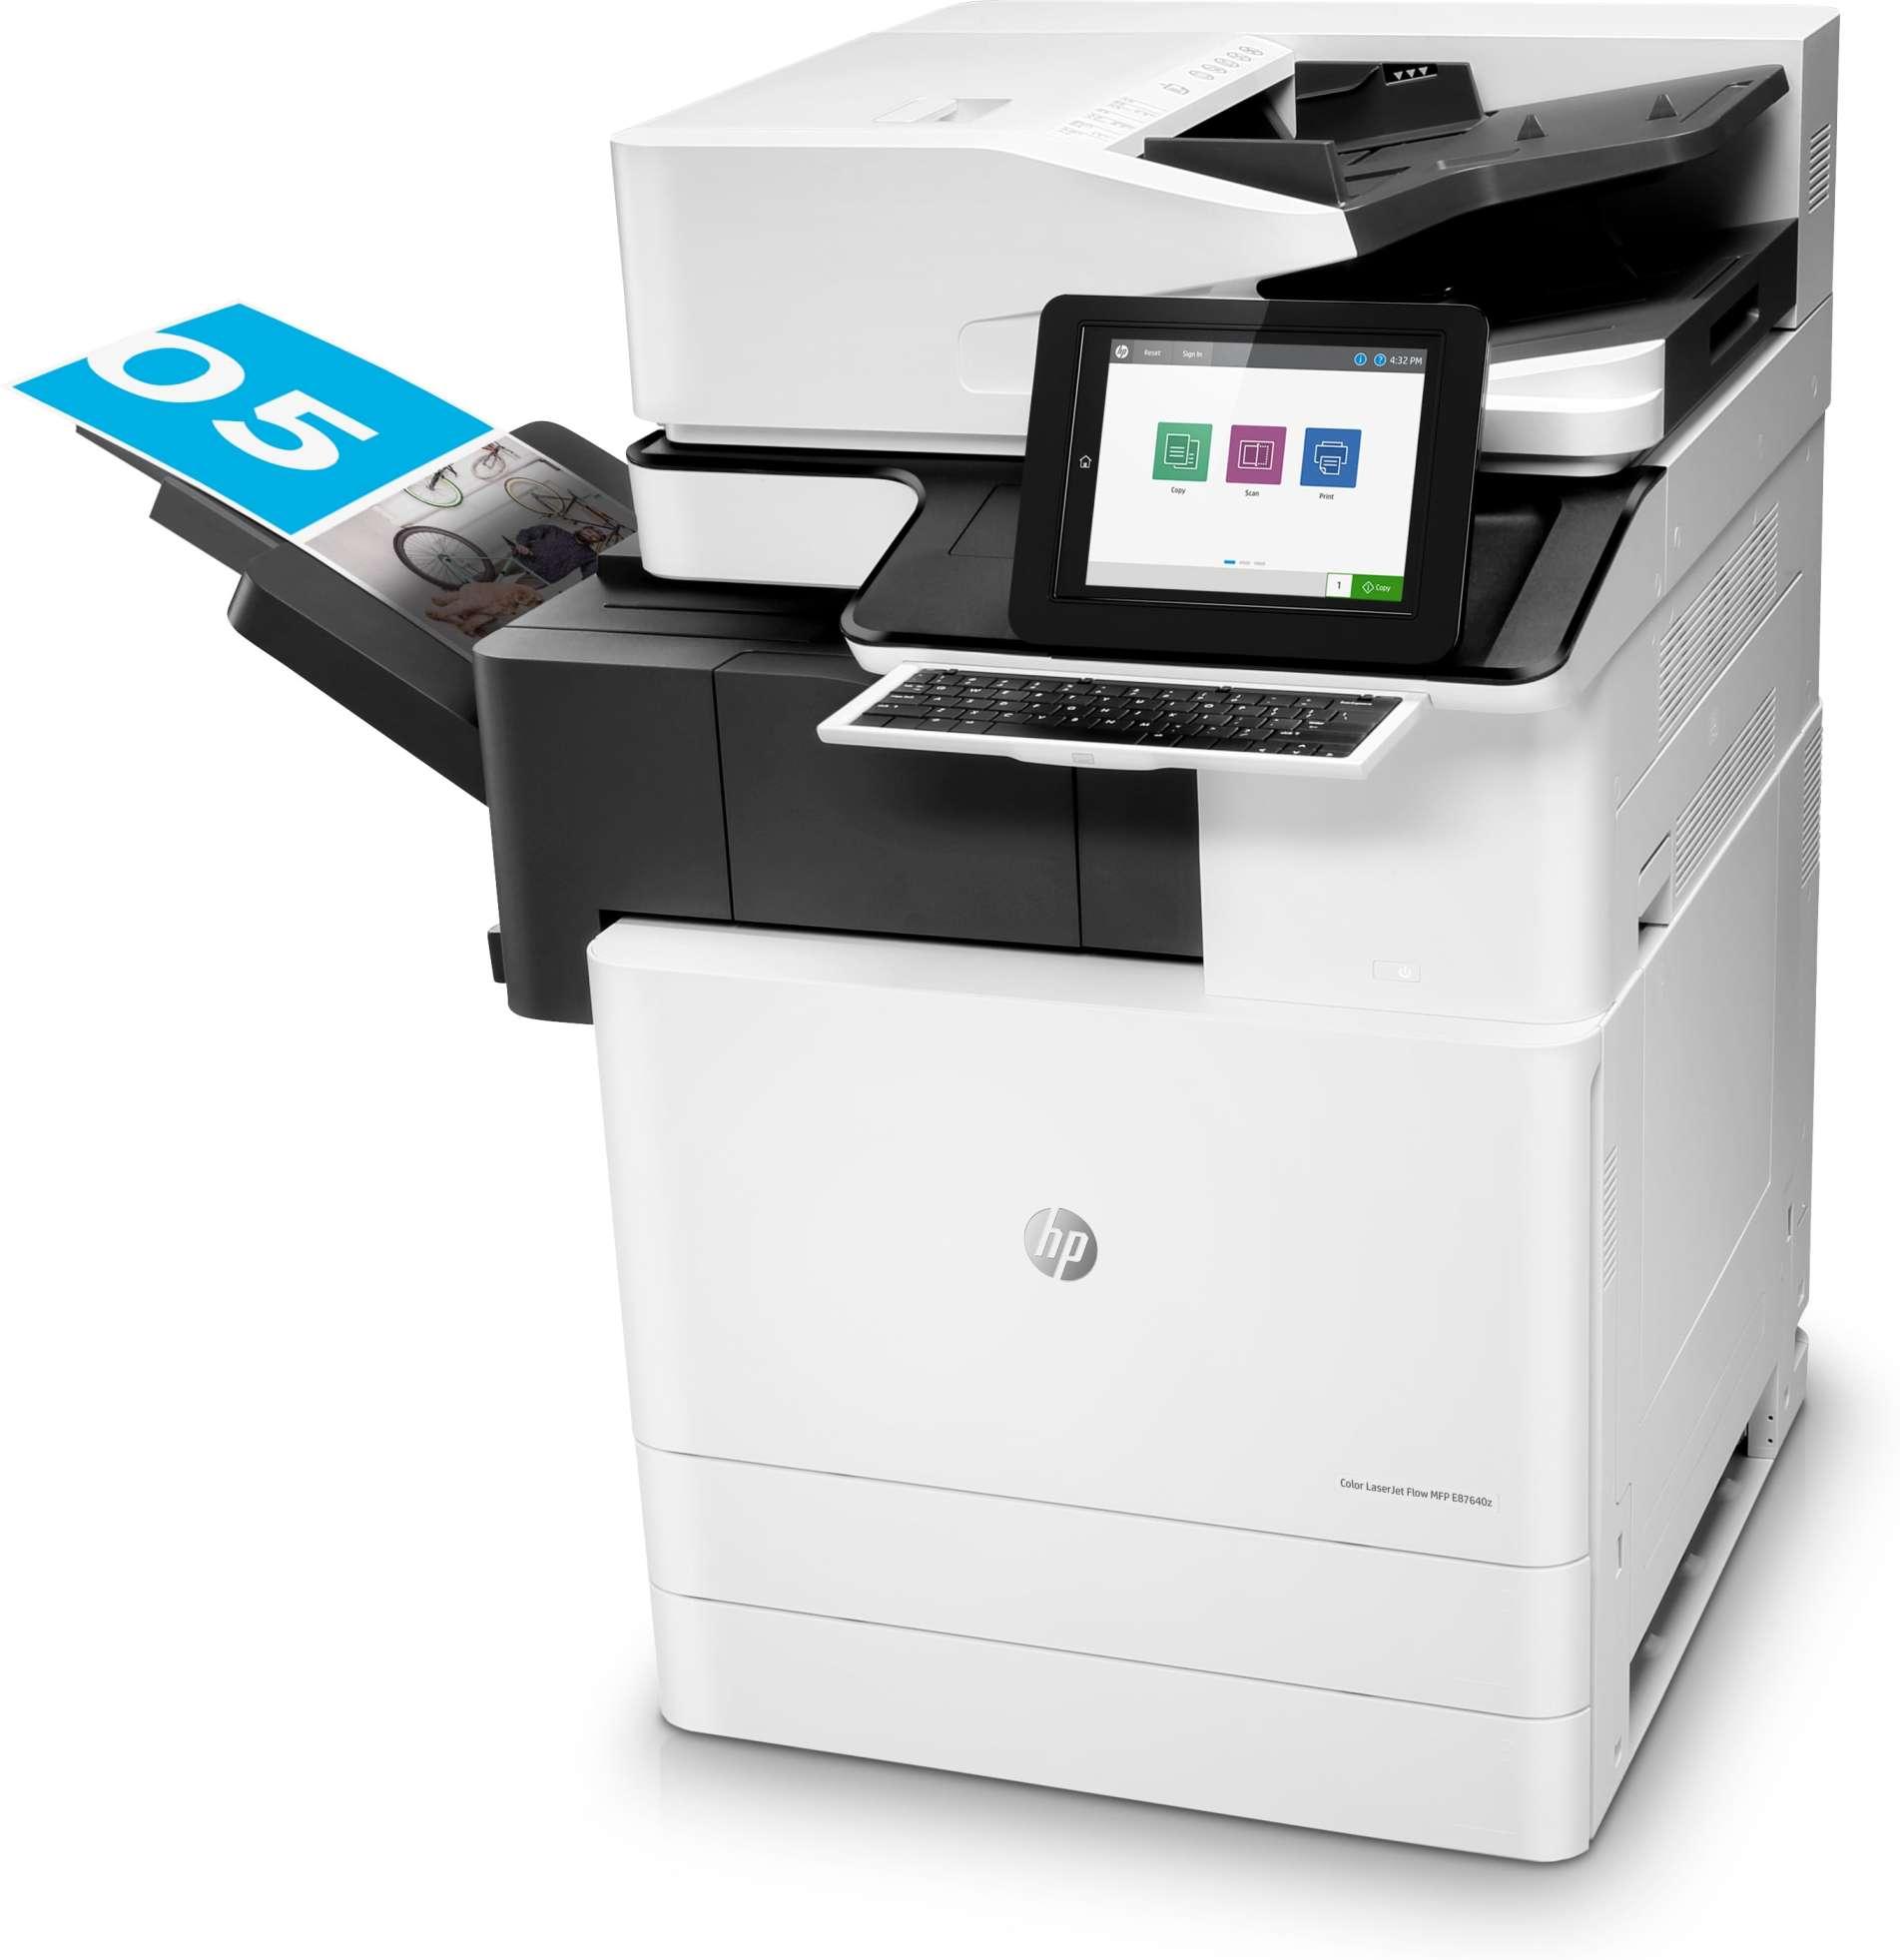 Impresora multifuncional HP LaserJet Managed E87650